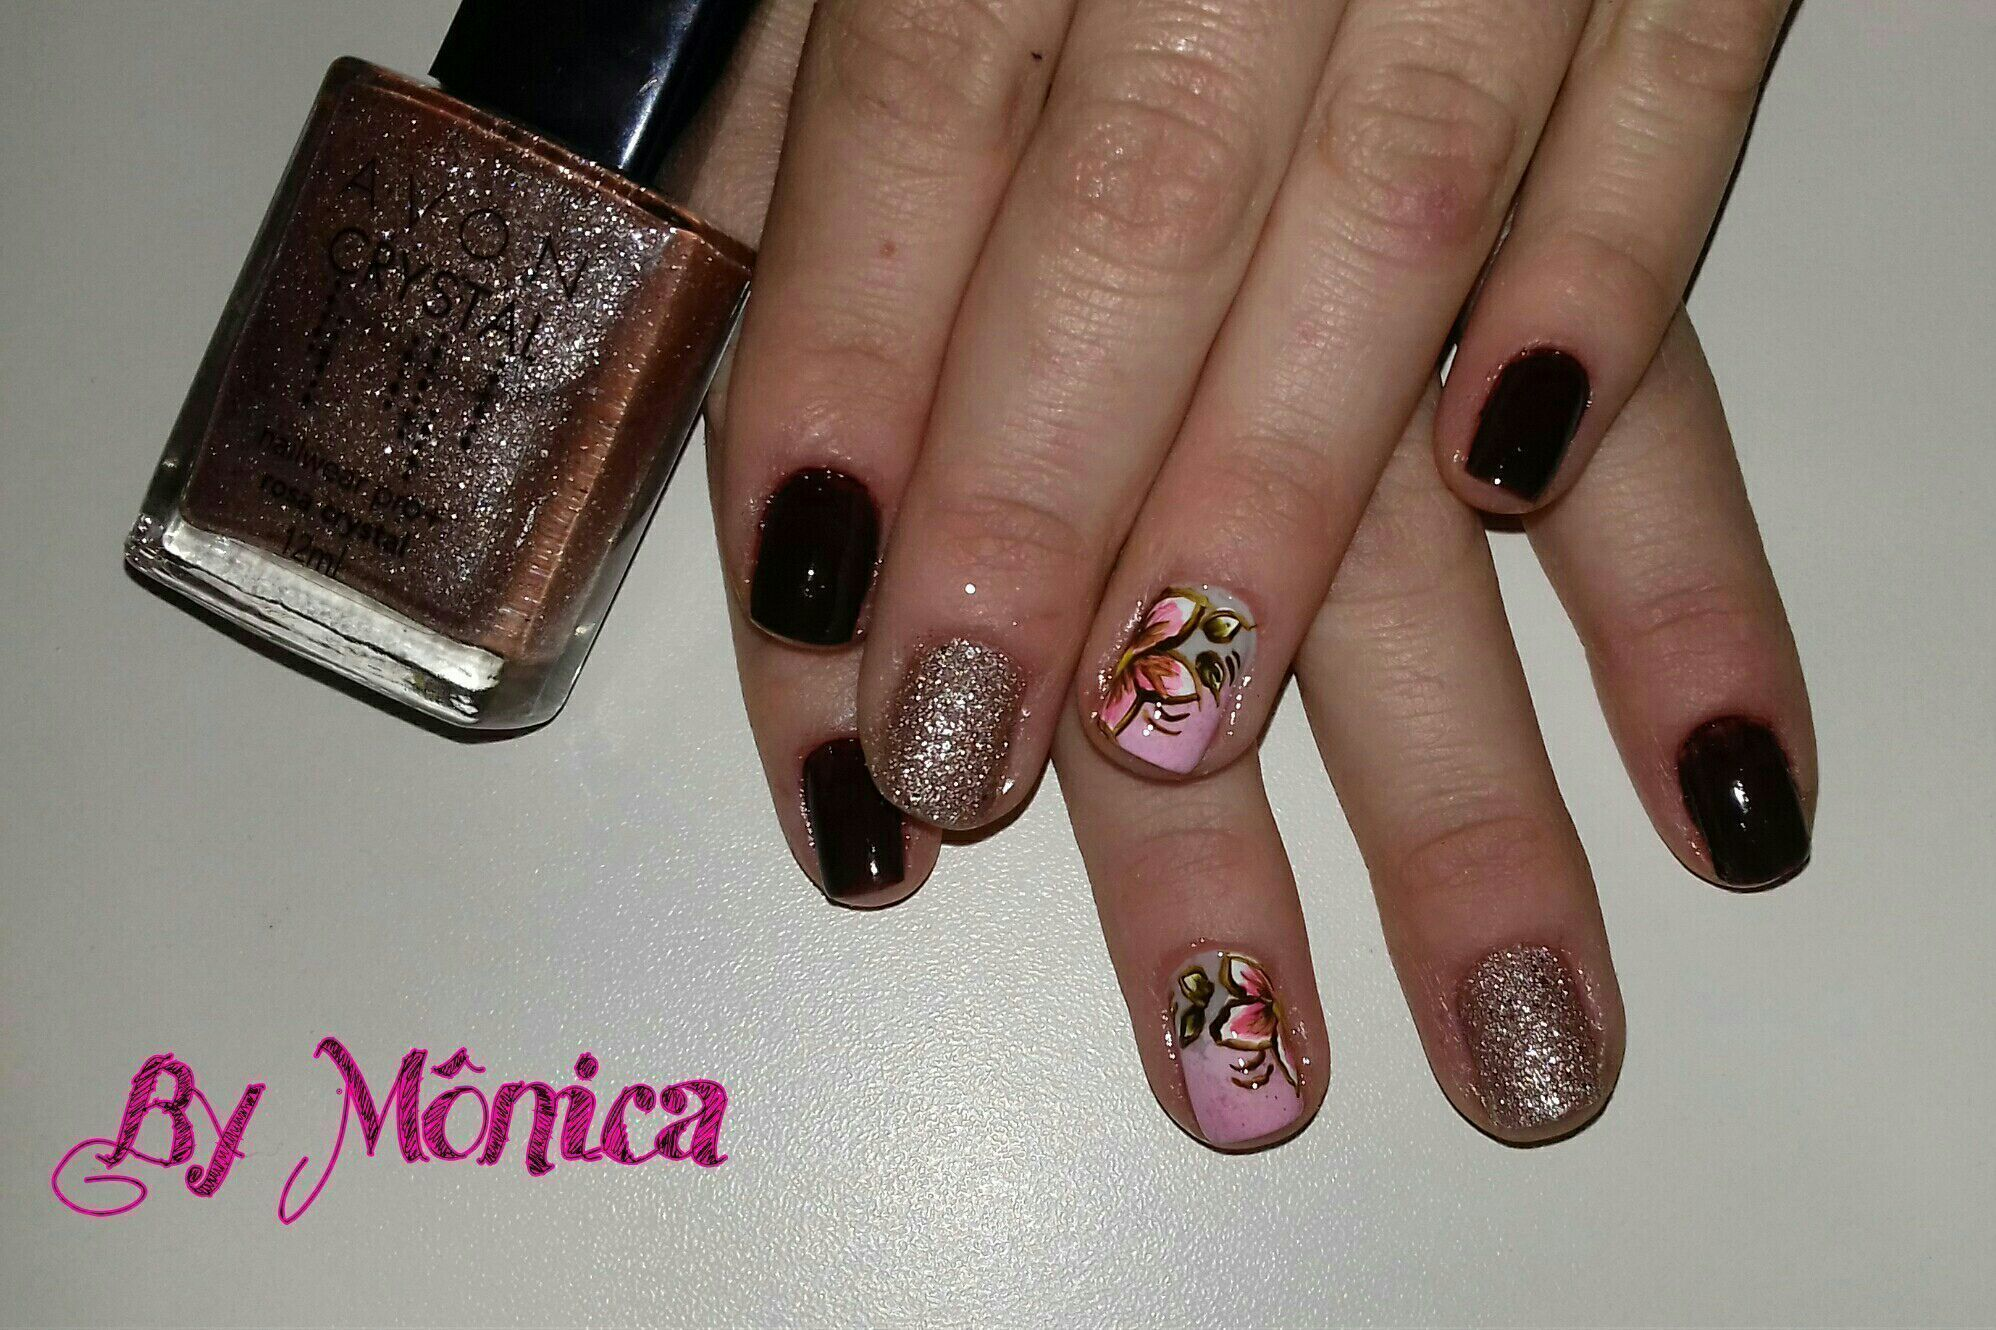 #unhasdecoradas #avoncrystal #desenhoartesanal unha manicure e pedicure manicure e pedicure